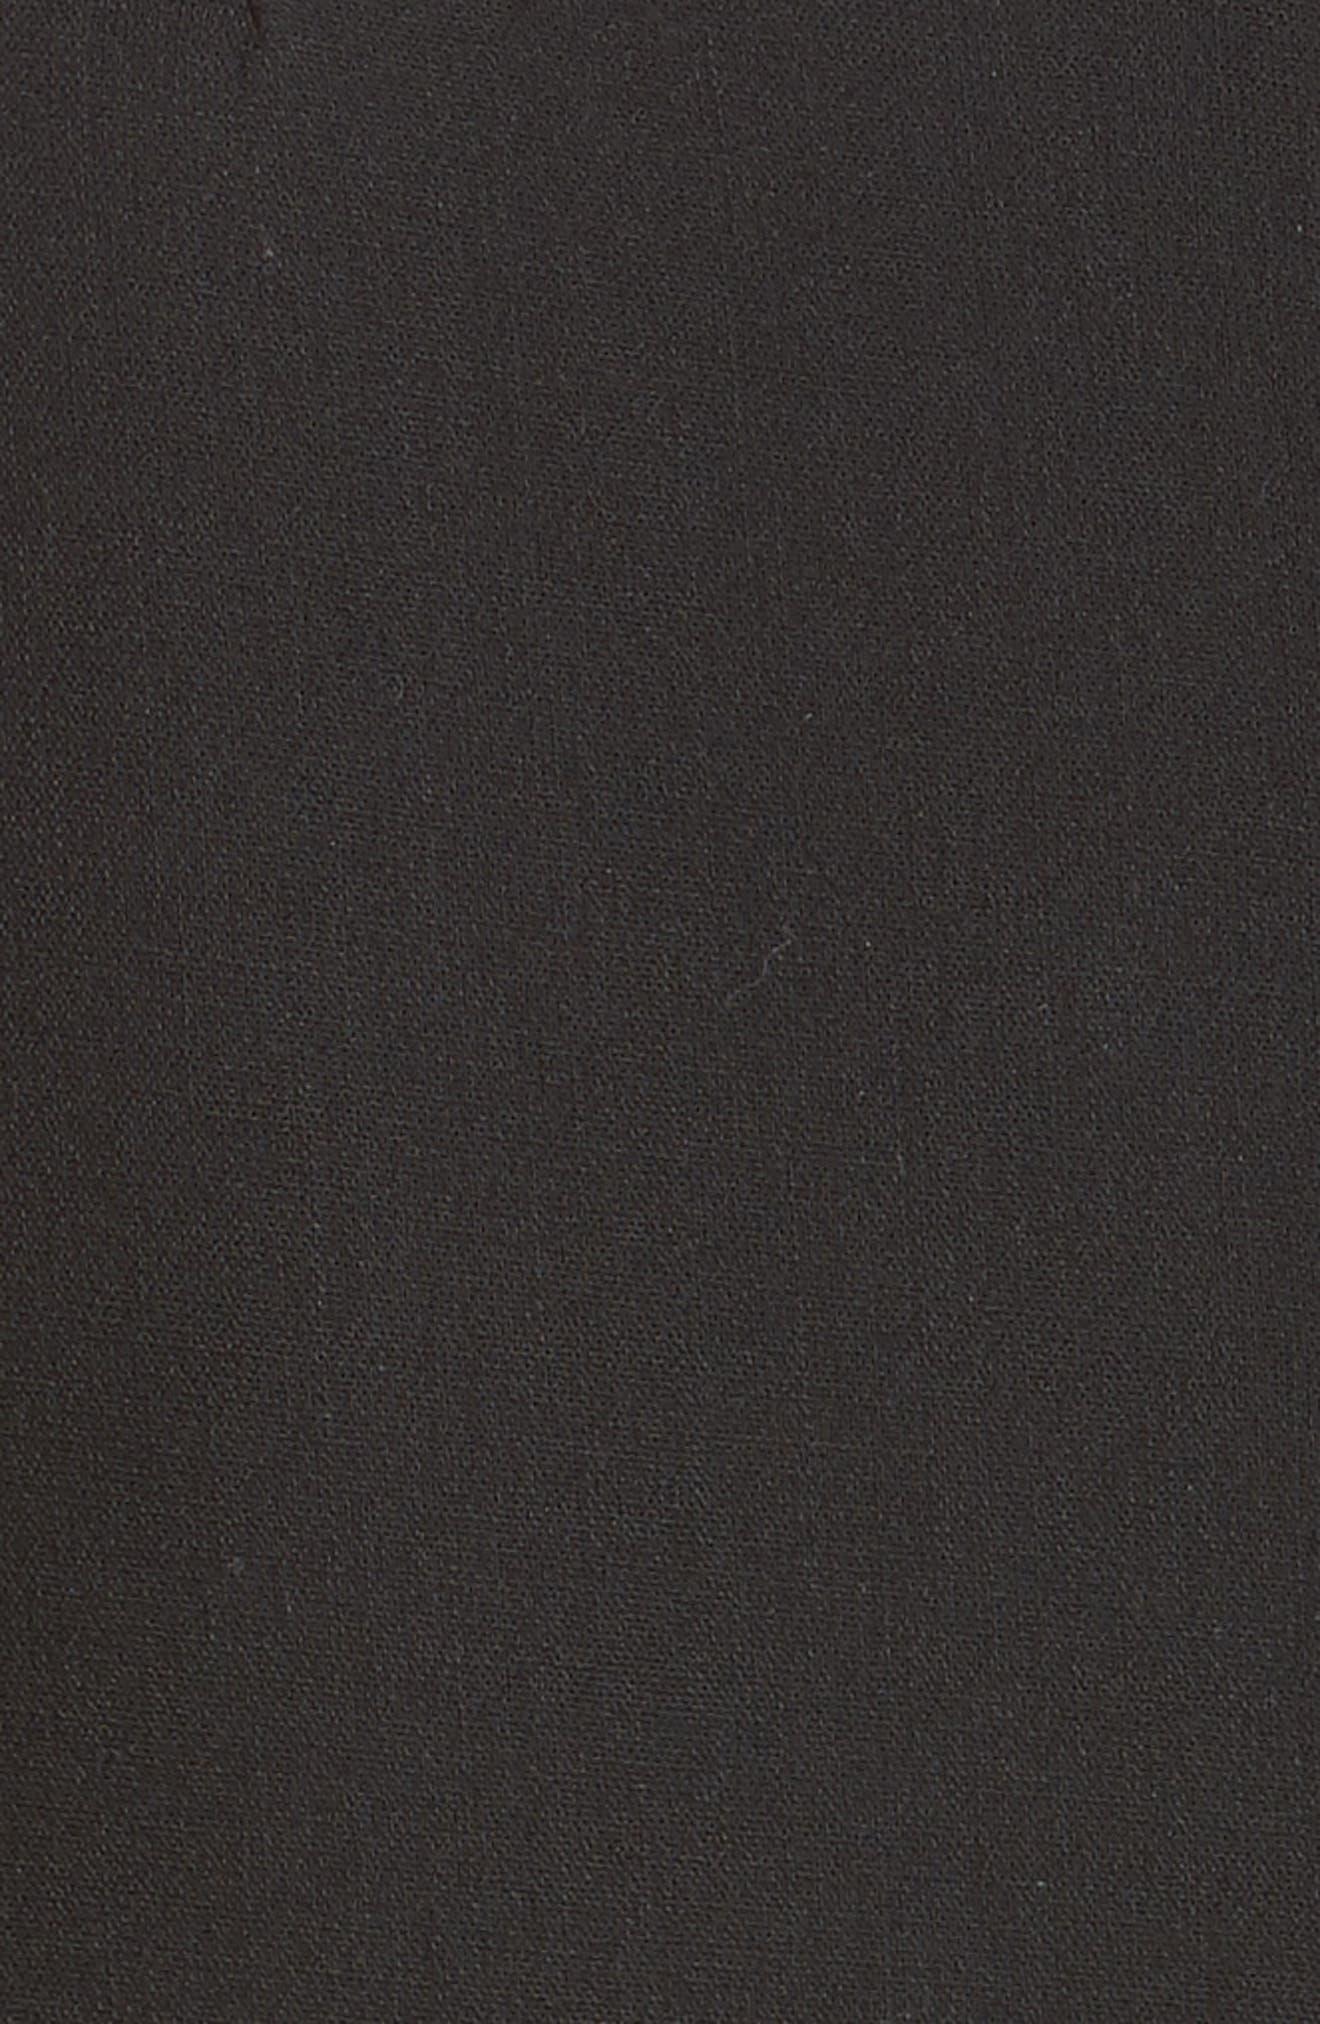 Alternate Image 3  - Michael Kors Stretch Wool Crepe Flounce Dress